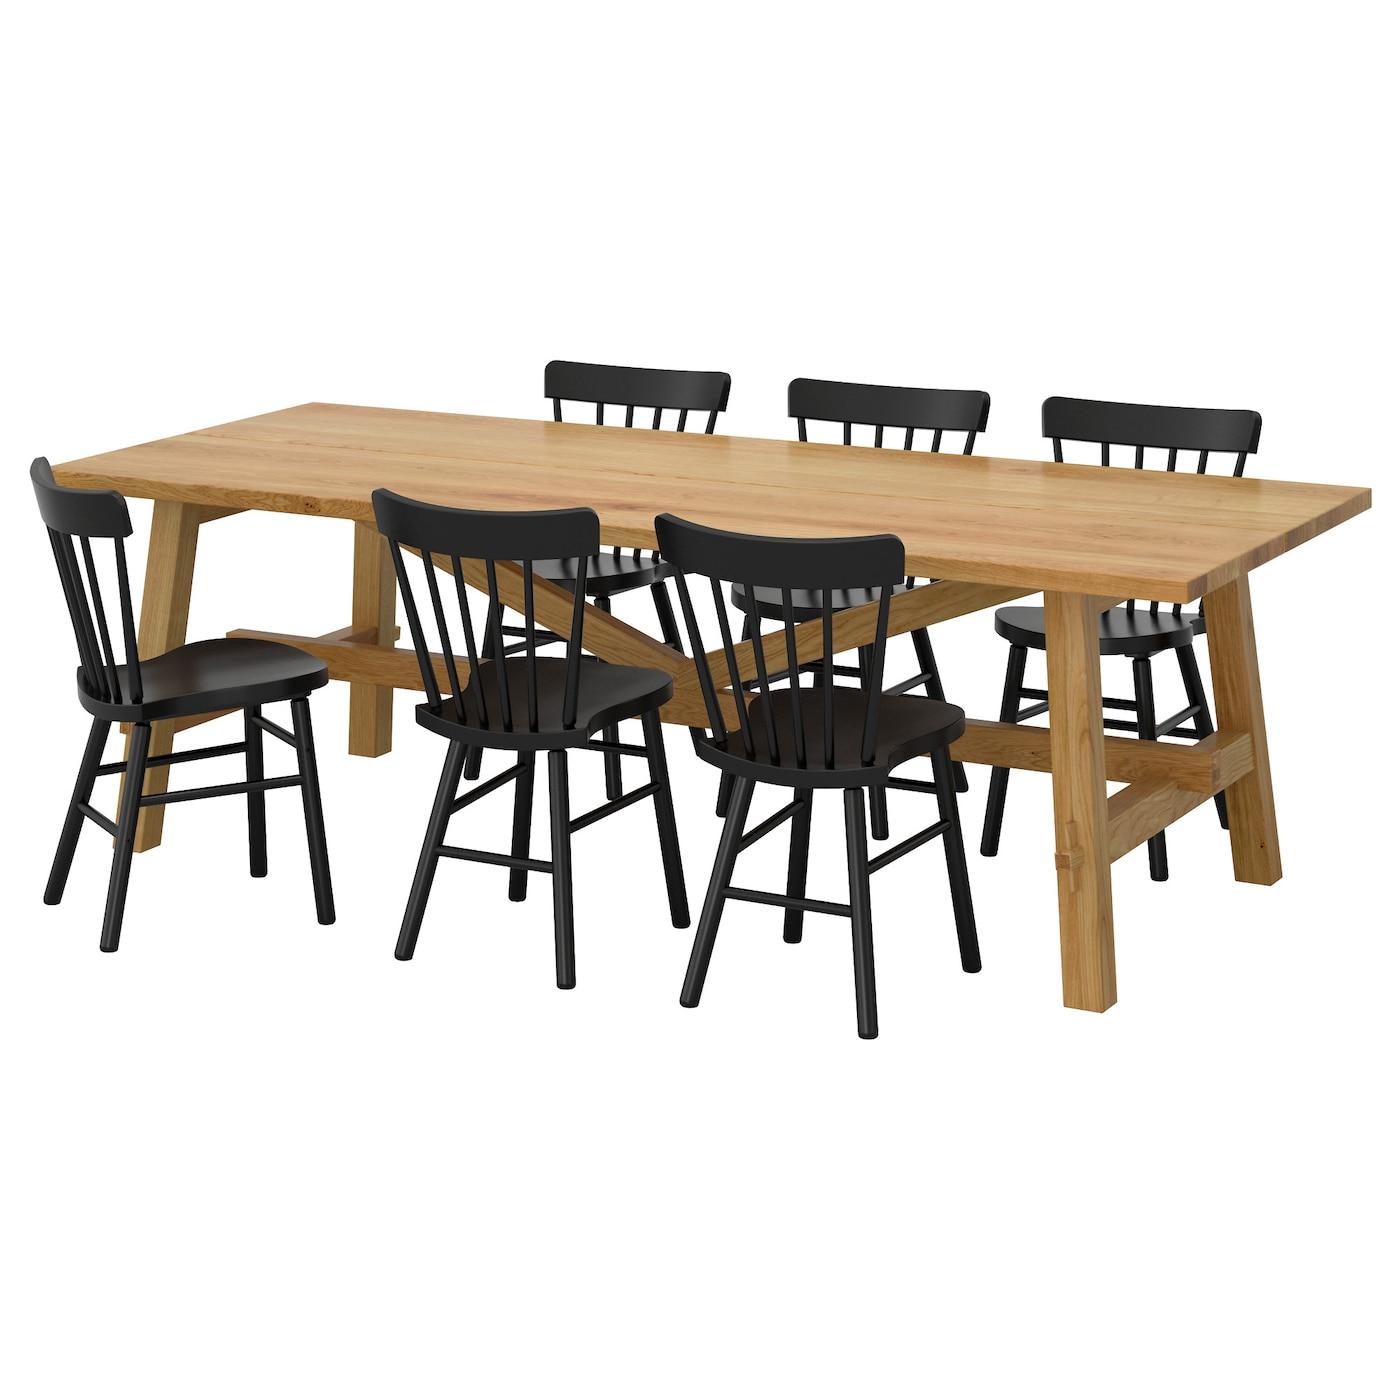 Norraryd m ckelby table et 6 chaises ch ne noir 235x100 cm for Table 6 chaises ikea